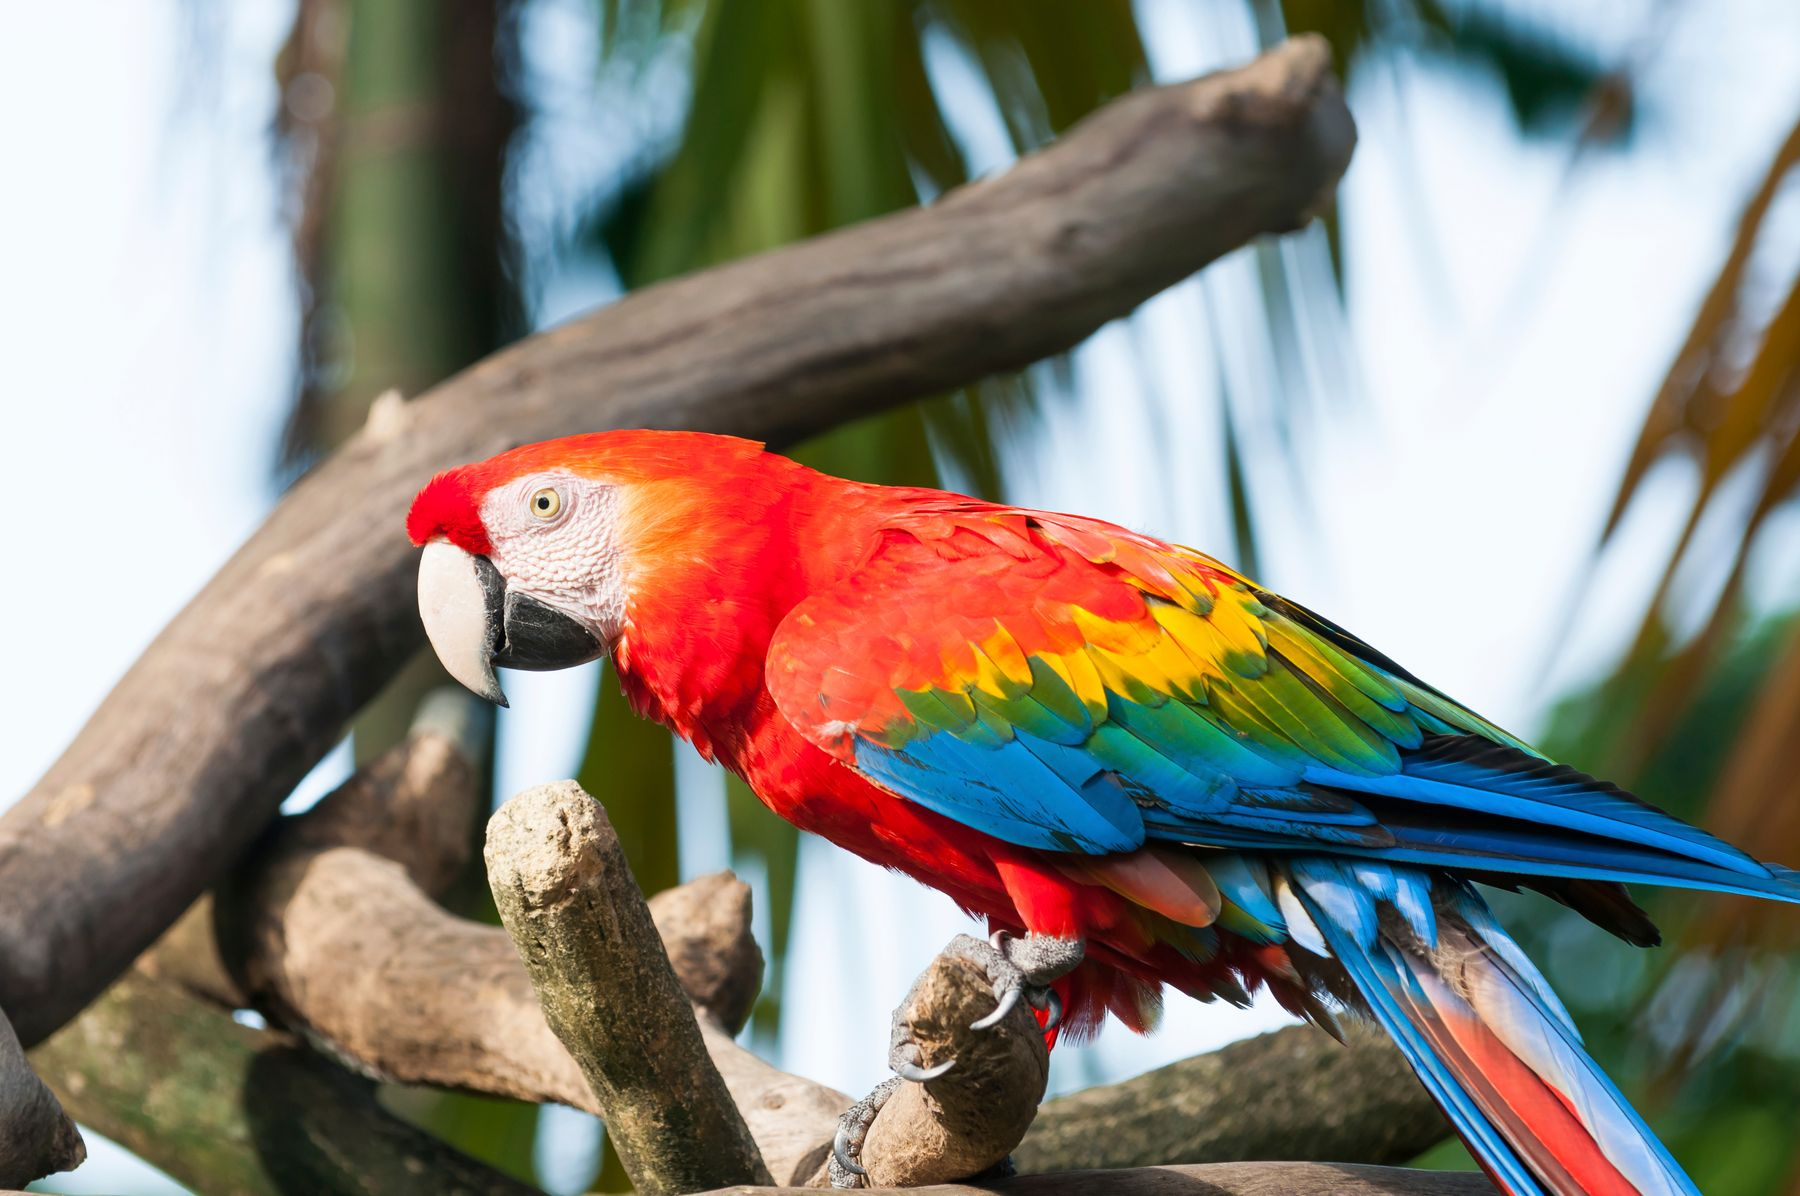 Maleny bird world has lots of exotic species